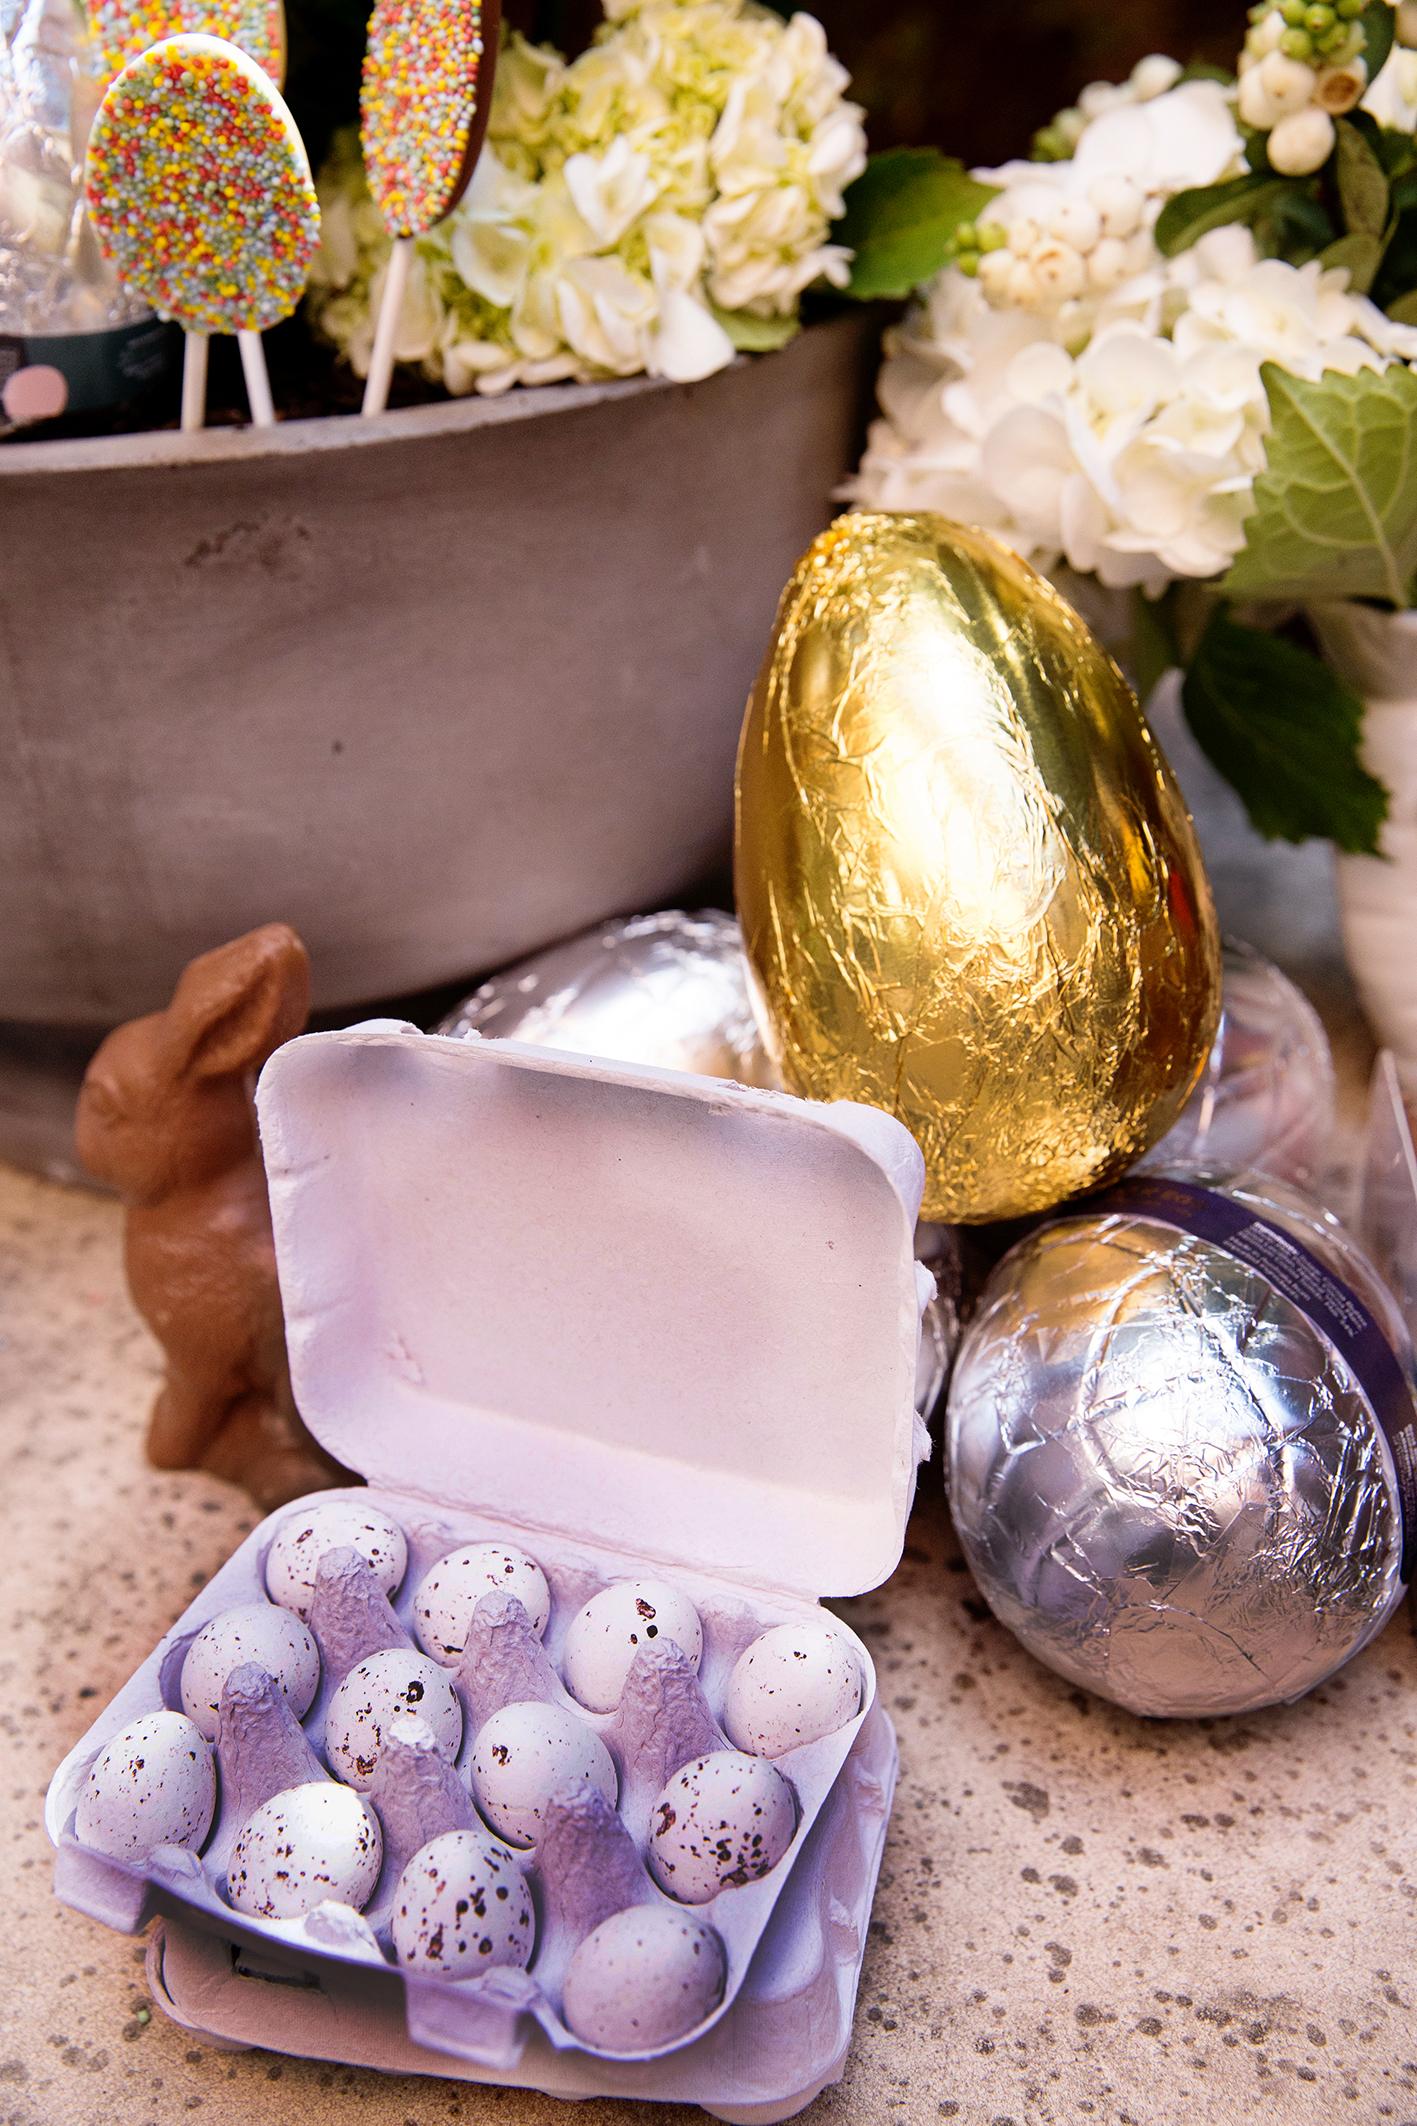 Chocolate Table 009.jpg